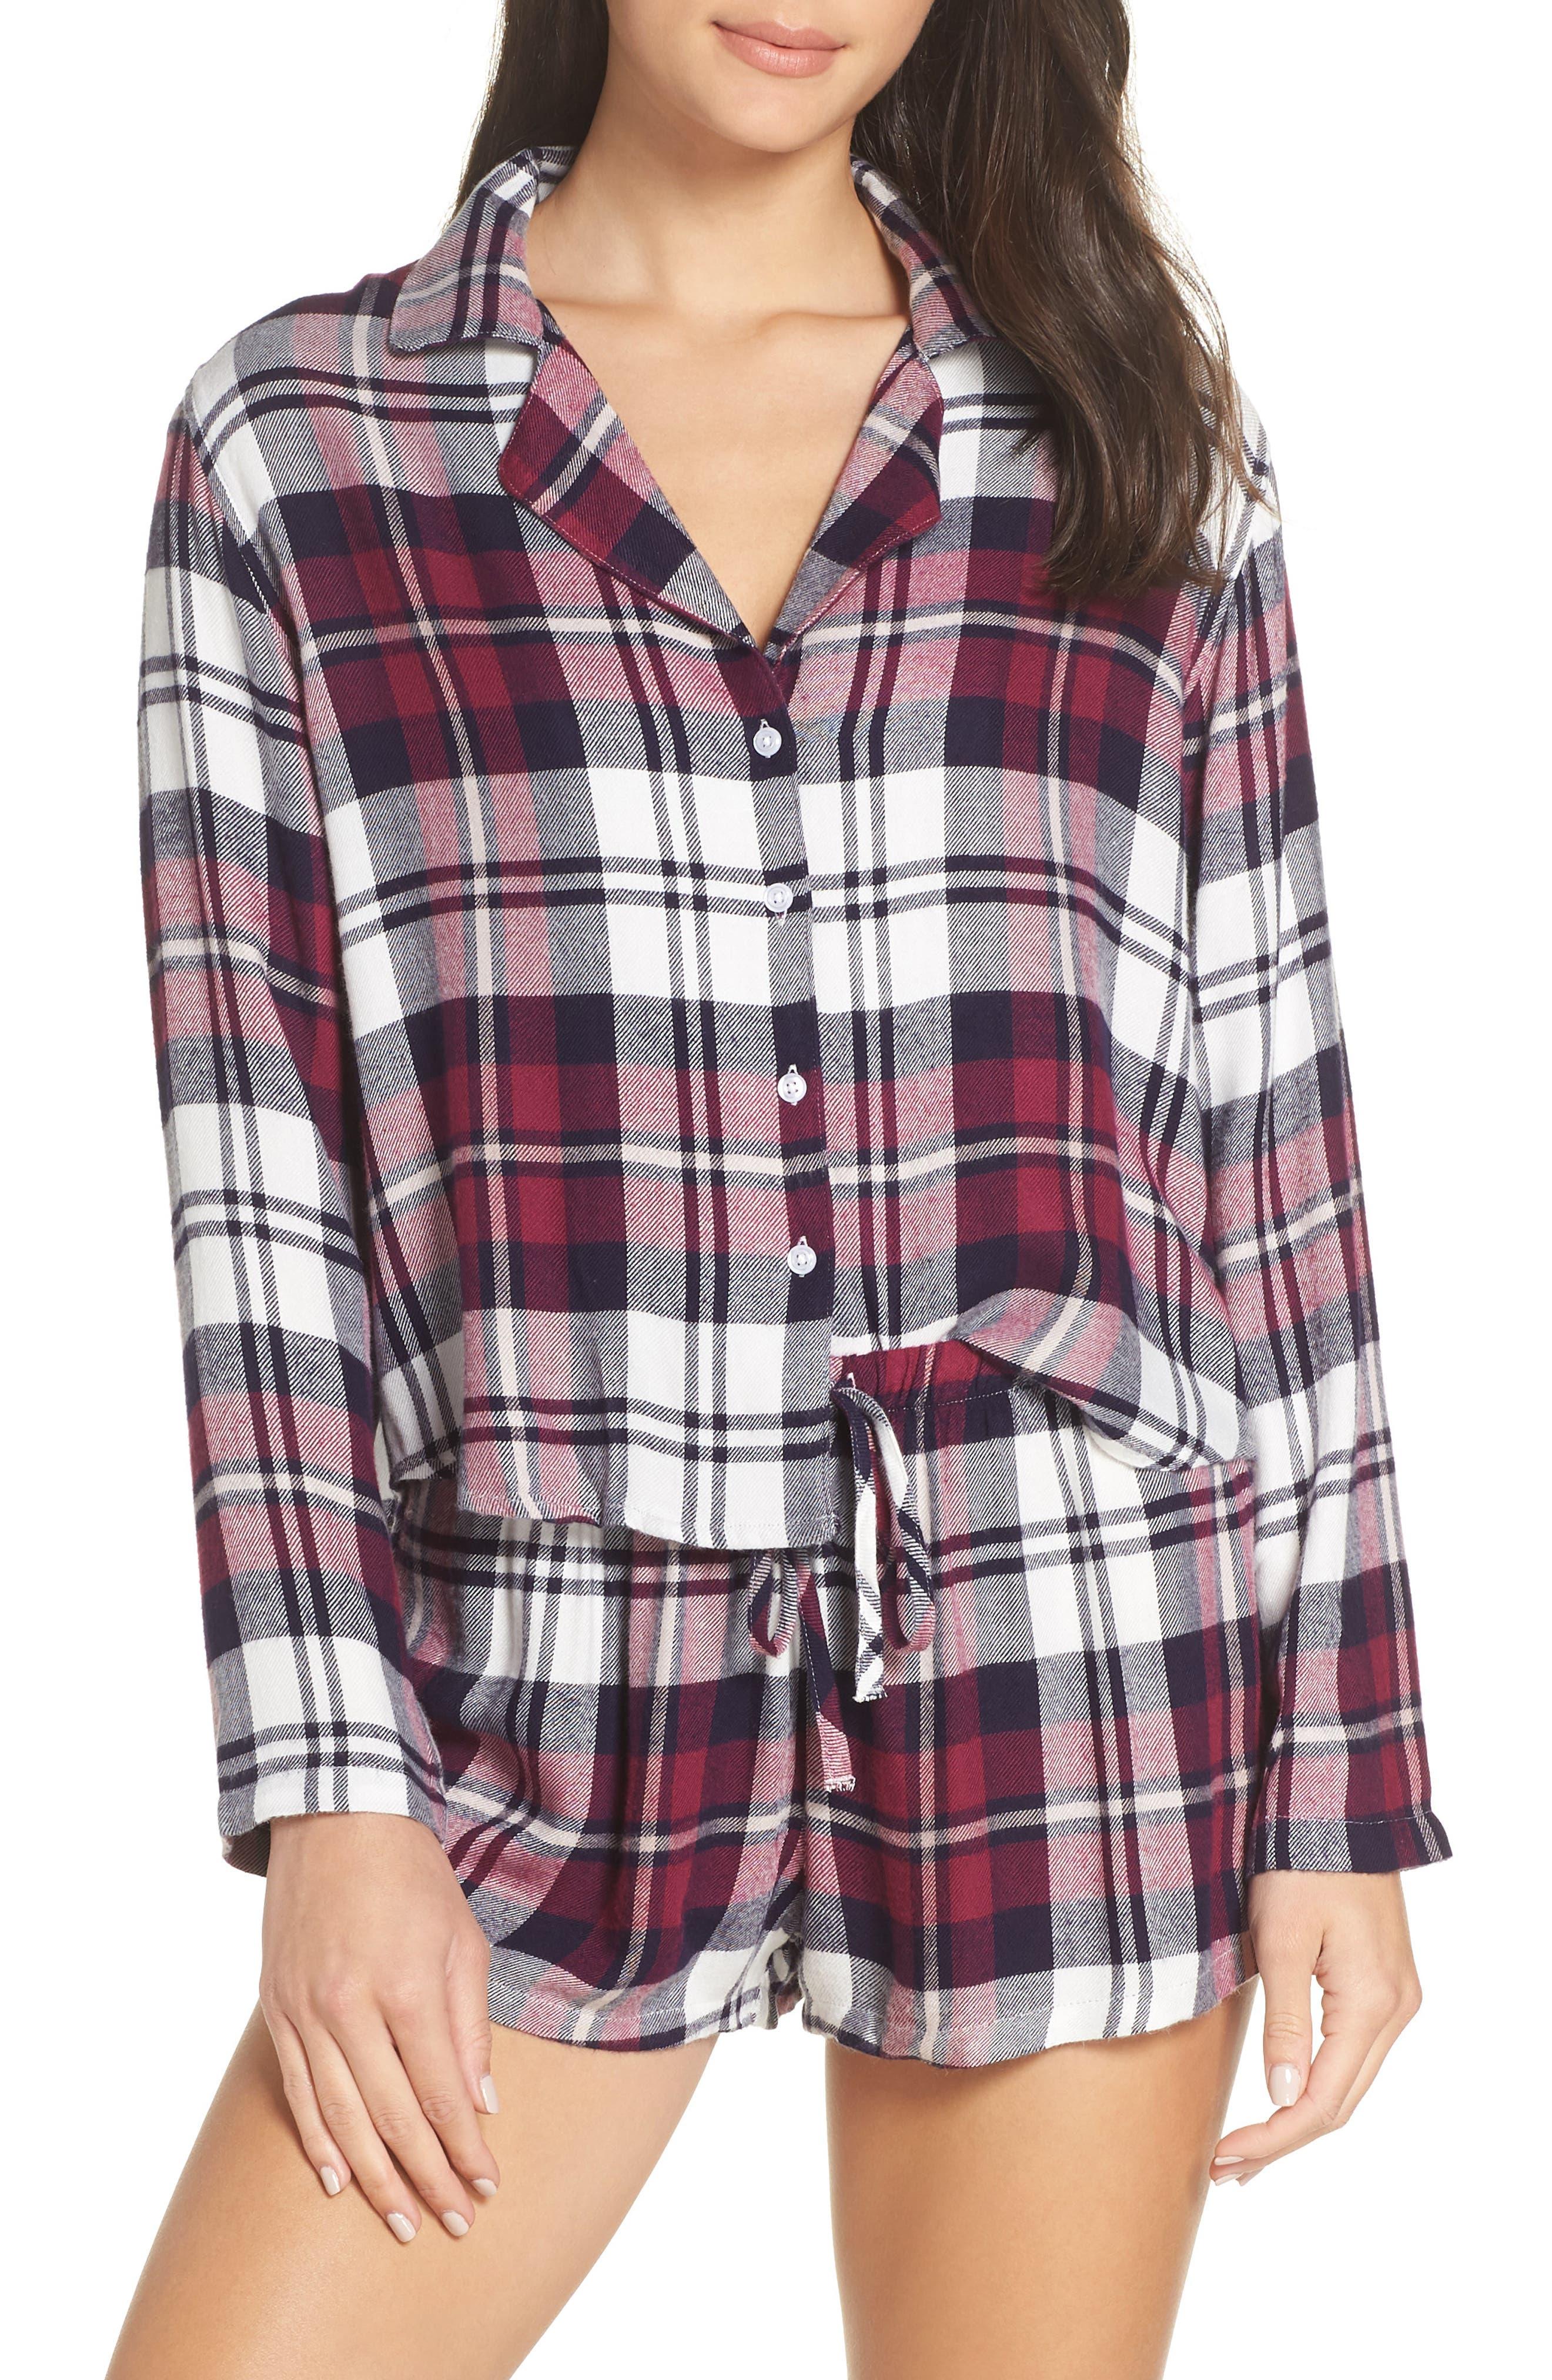 Plaid Short Pajamas,                             Main thumbnail 1, color,                             MULBERRY NAVY WHITE